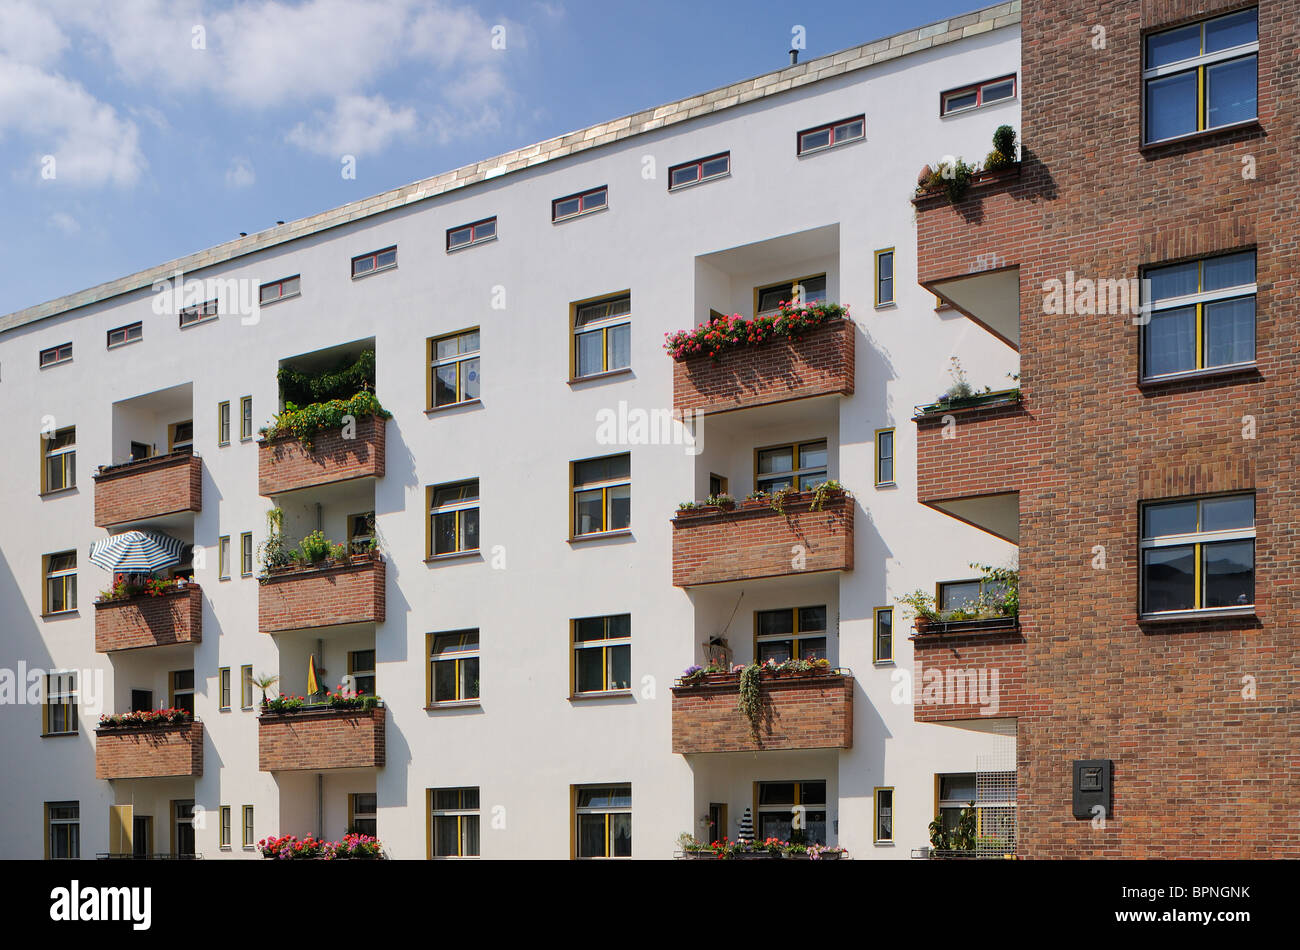 Schoenlanker Strasse Berlin Modernism Housing Estate, Ernst-Fuerstenberg-Strasse, Prenzlauer Berg, Pankow, Berlin, - Stock Image